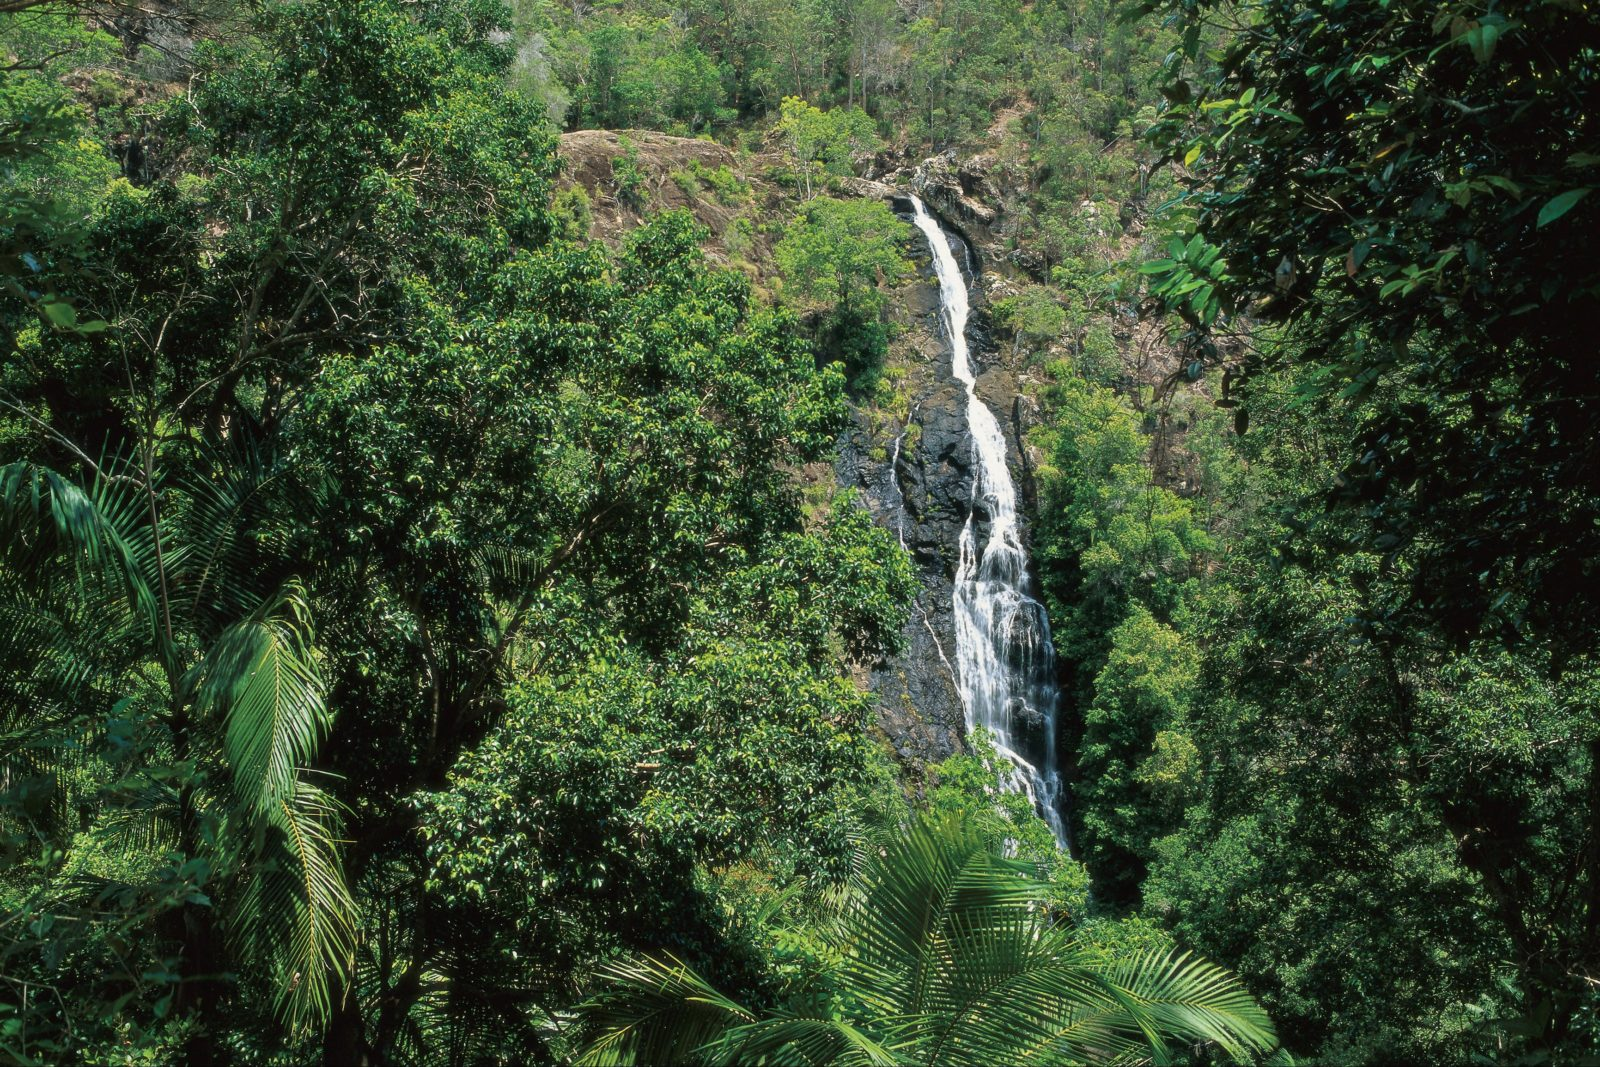 View of Mapleton Falls in rainforest.